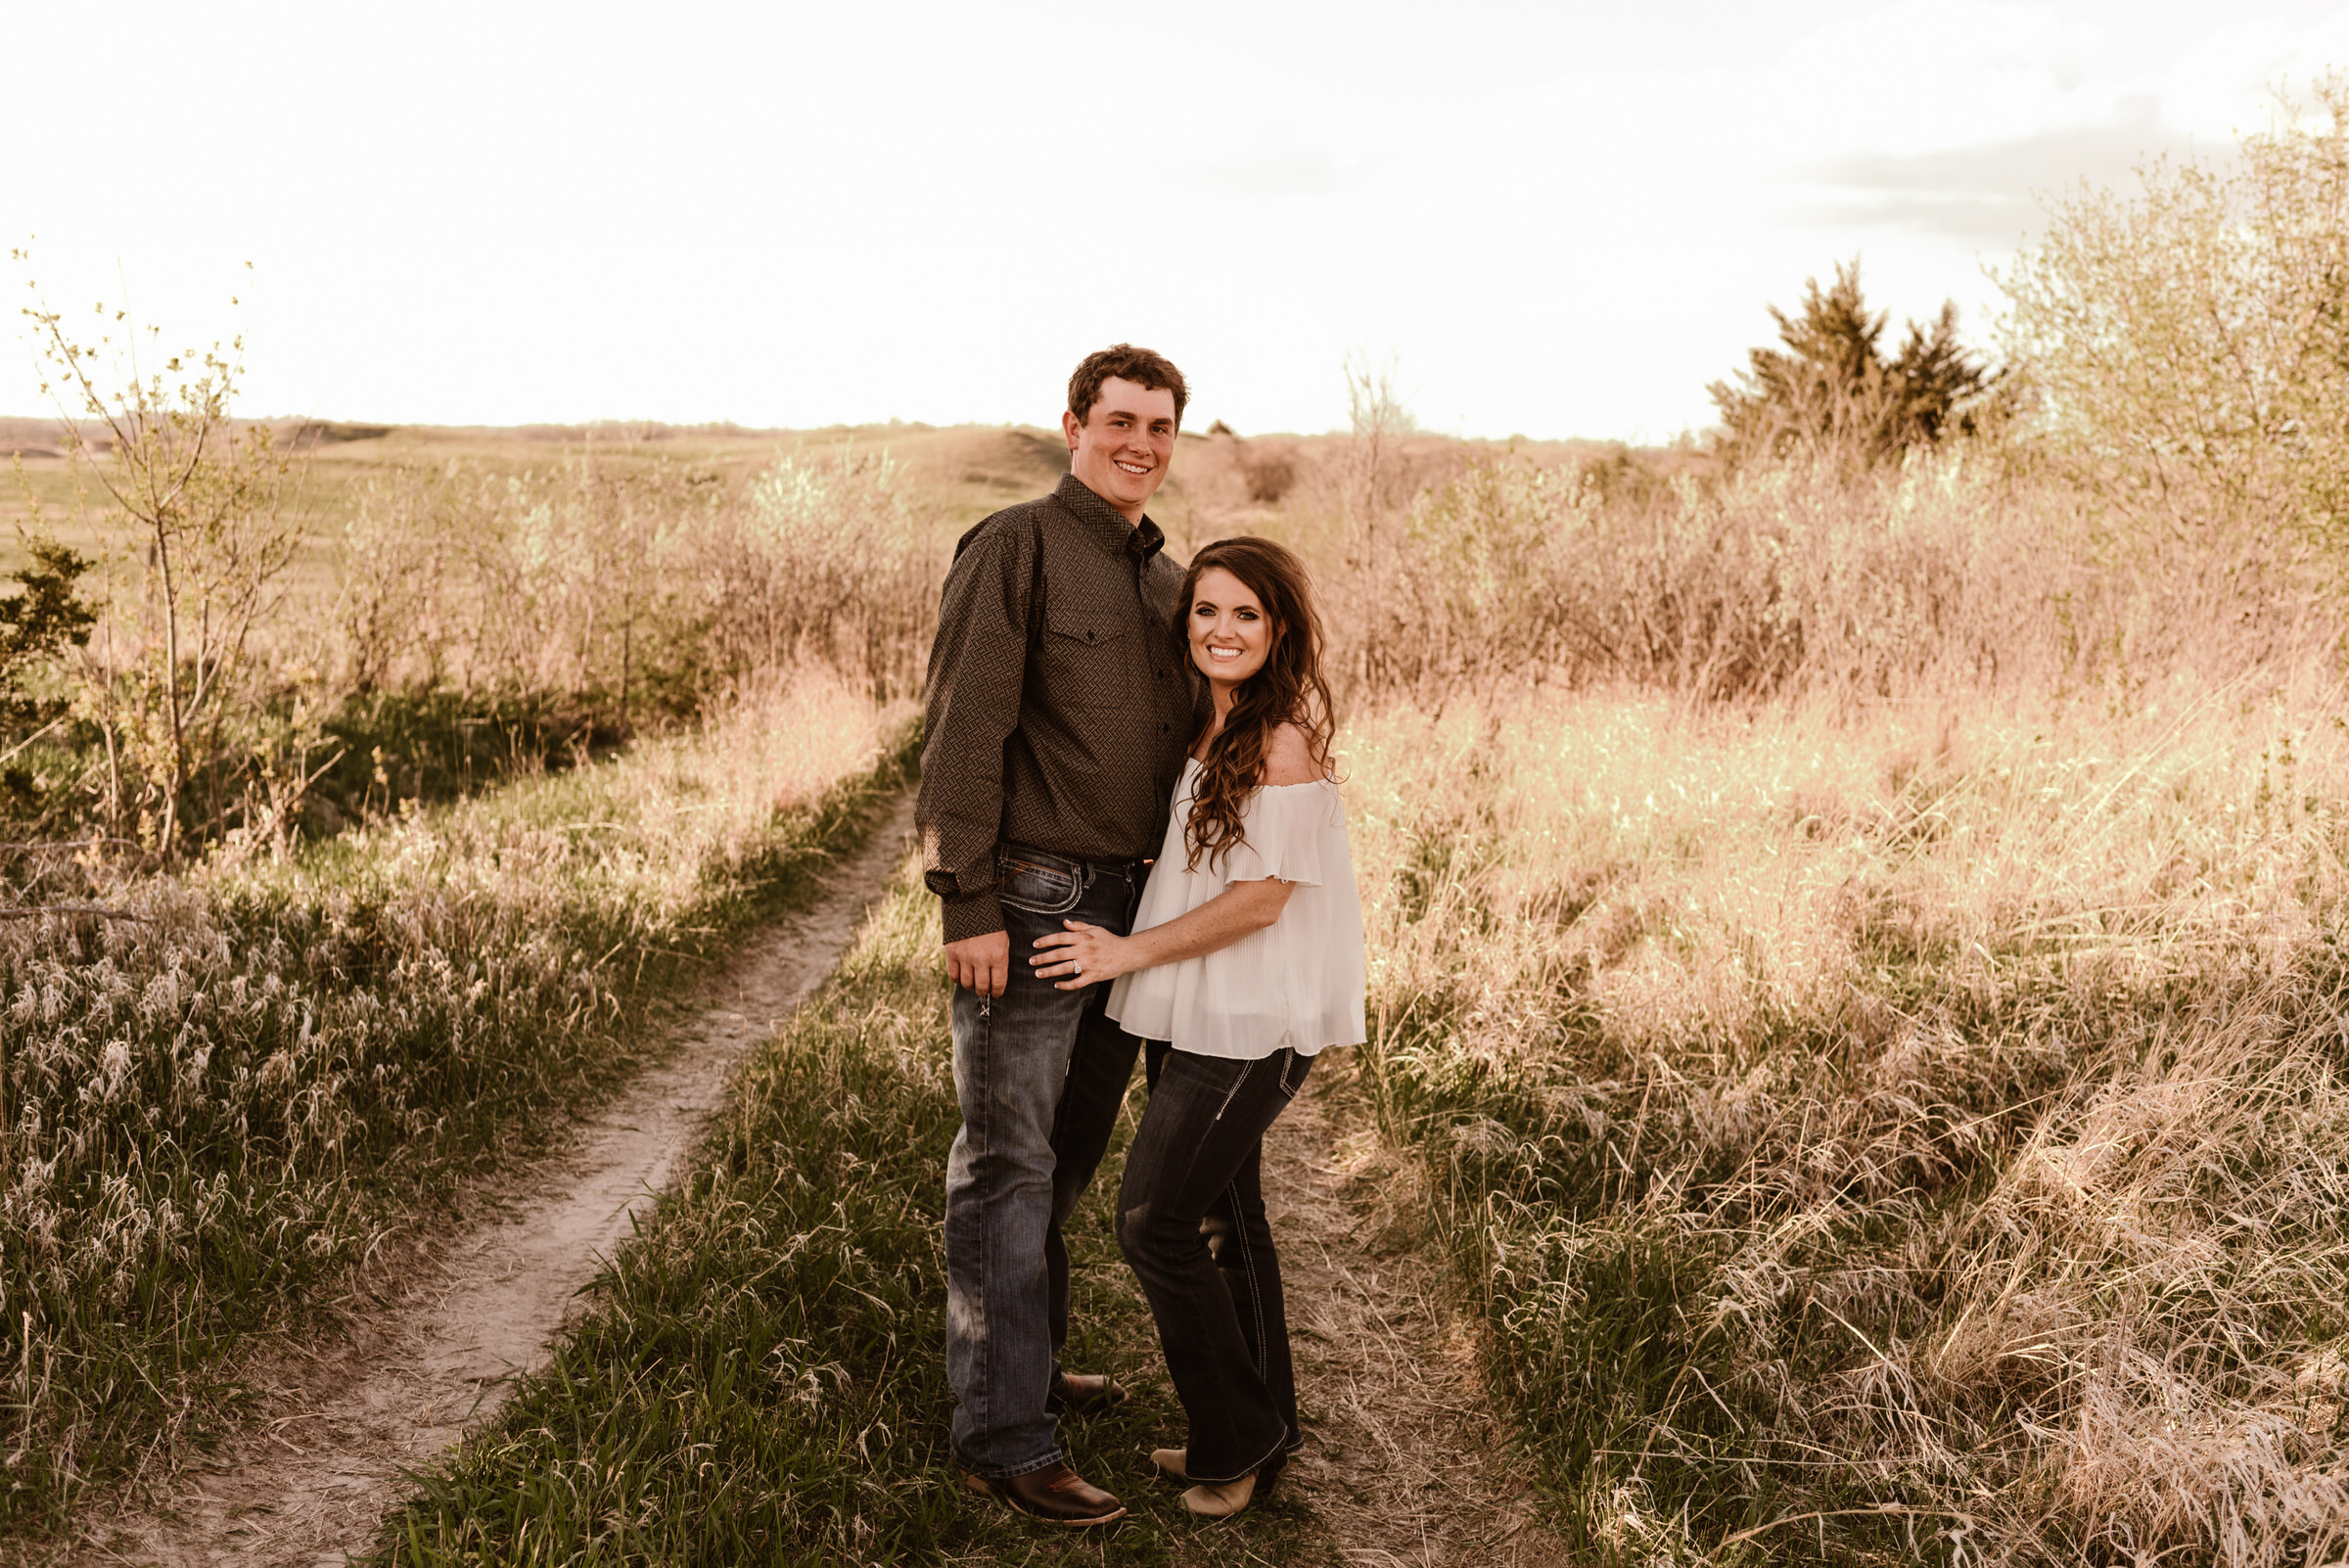 Sandhills-Nebraska-Engagement-Wedding-Photographer-Kaylie-Sirek-Photography-008.jpg